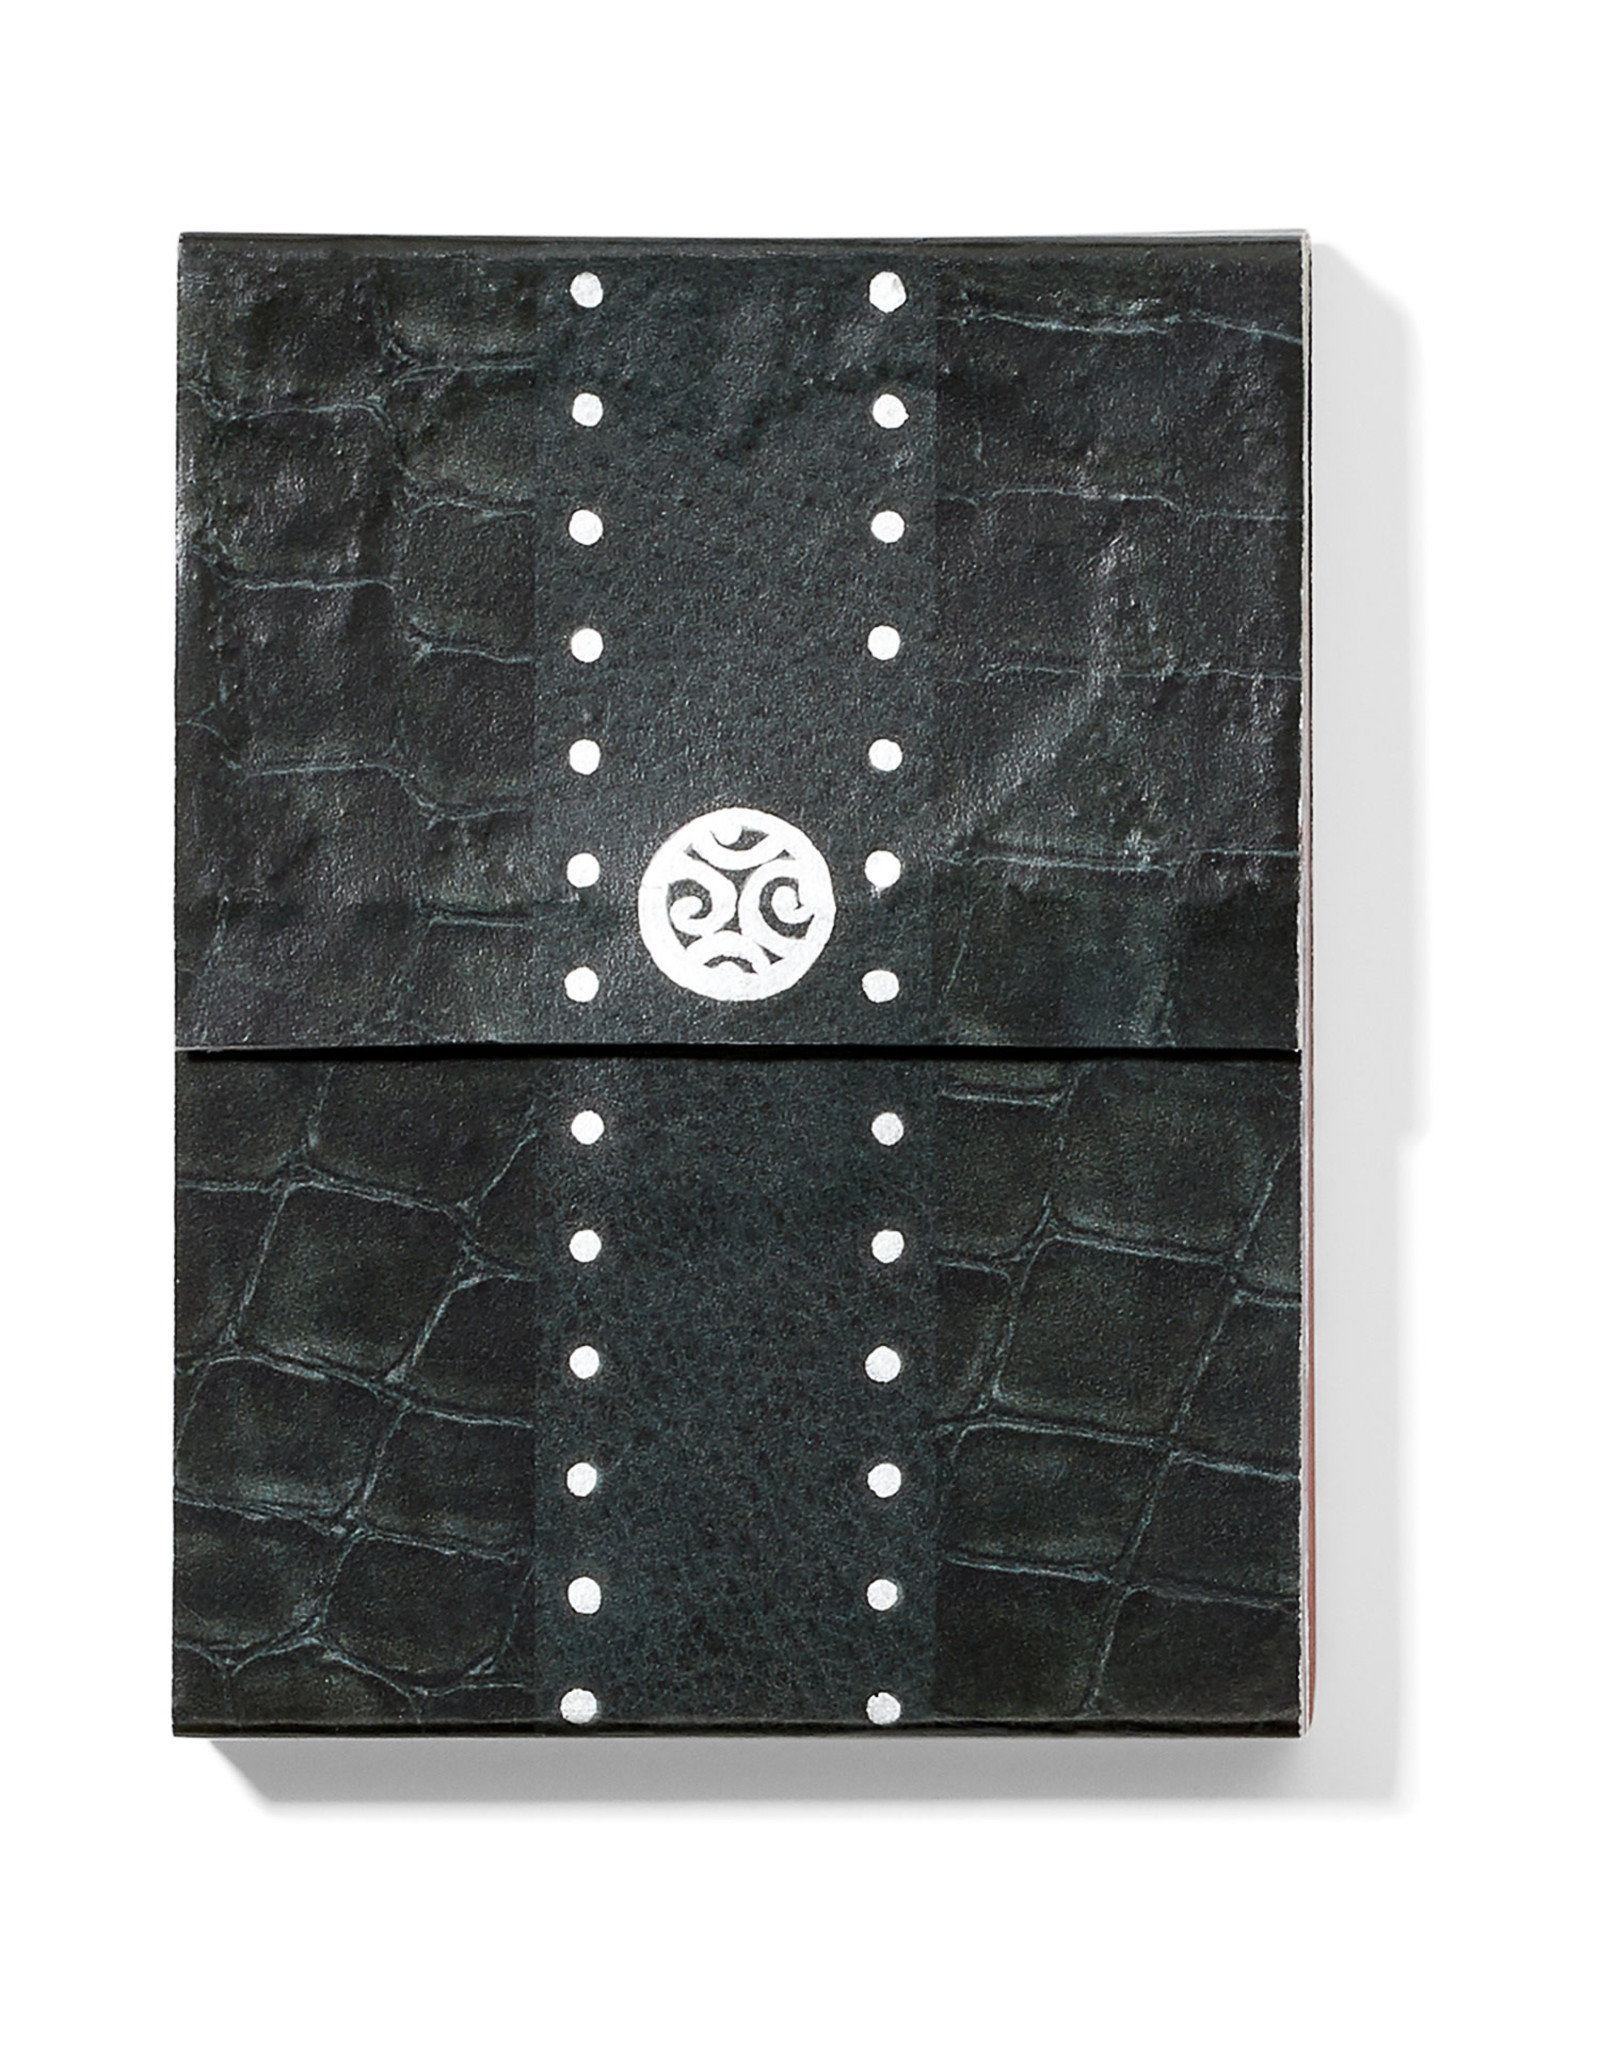 Brighton G82953 Pretty Tough Croco Notepad